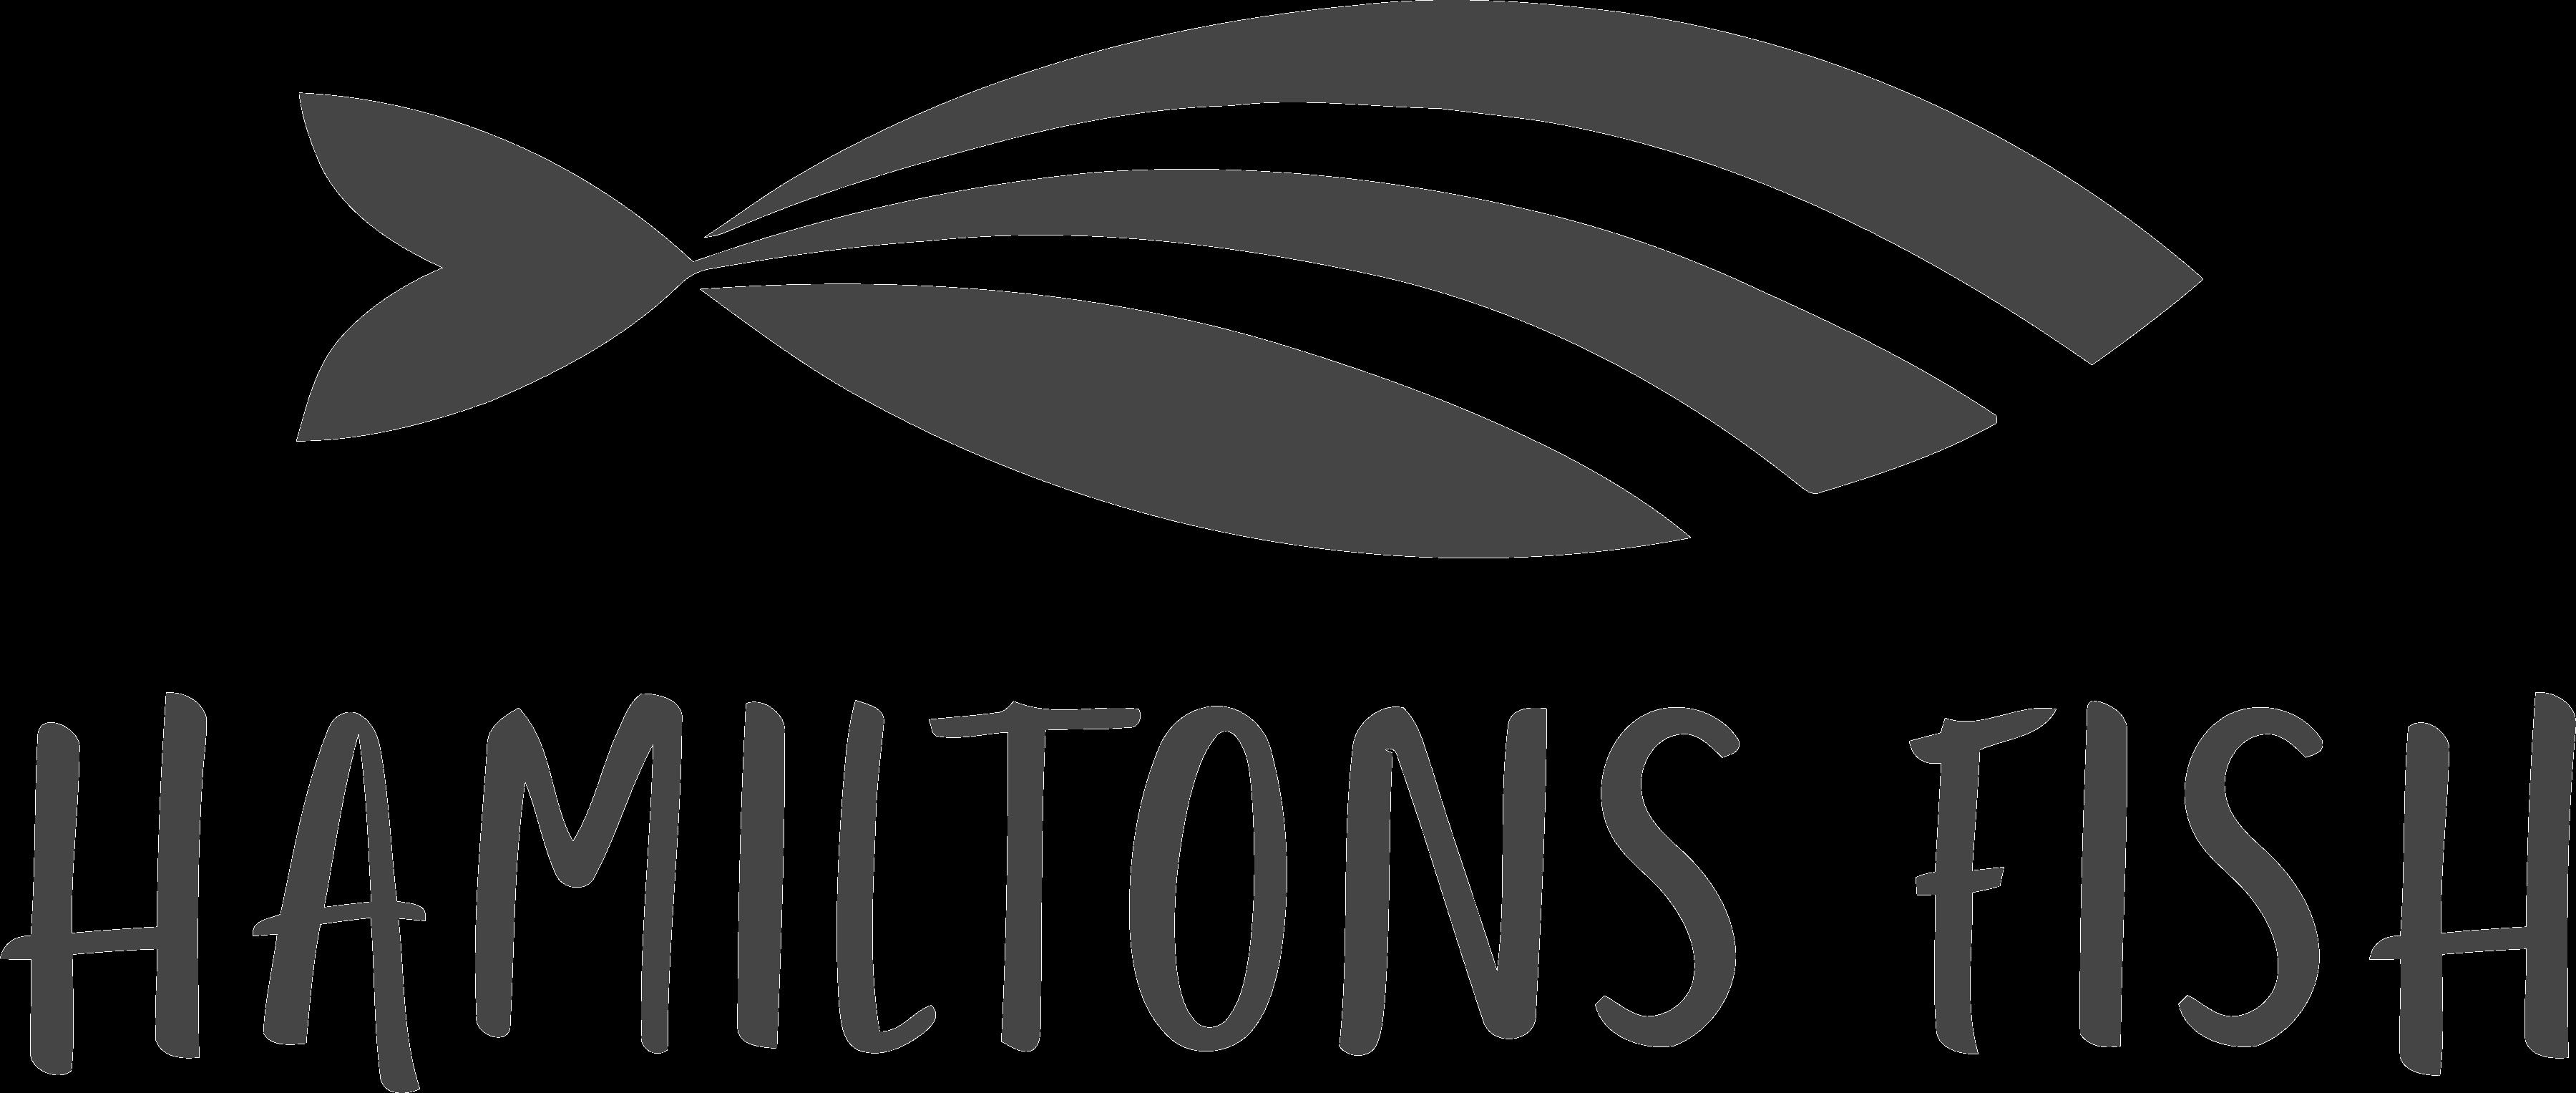 Read Hamiltons Fish Reviews